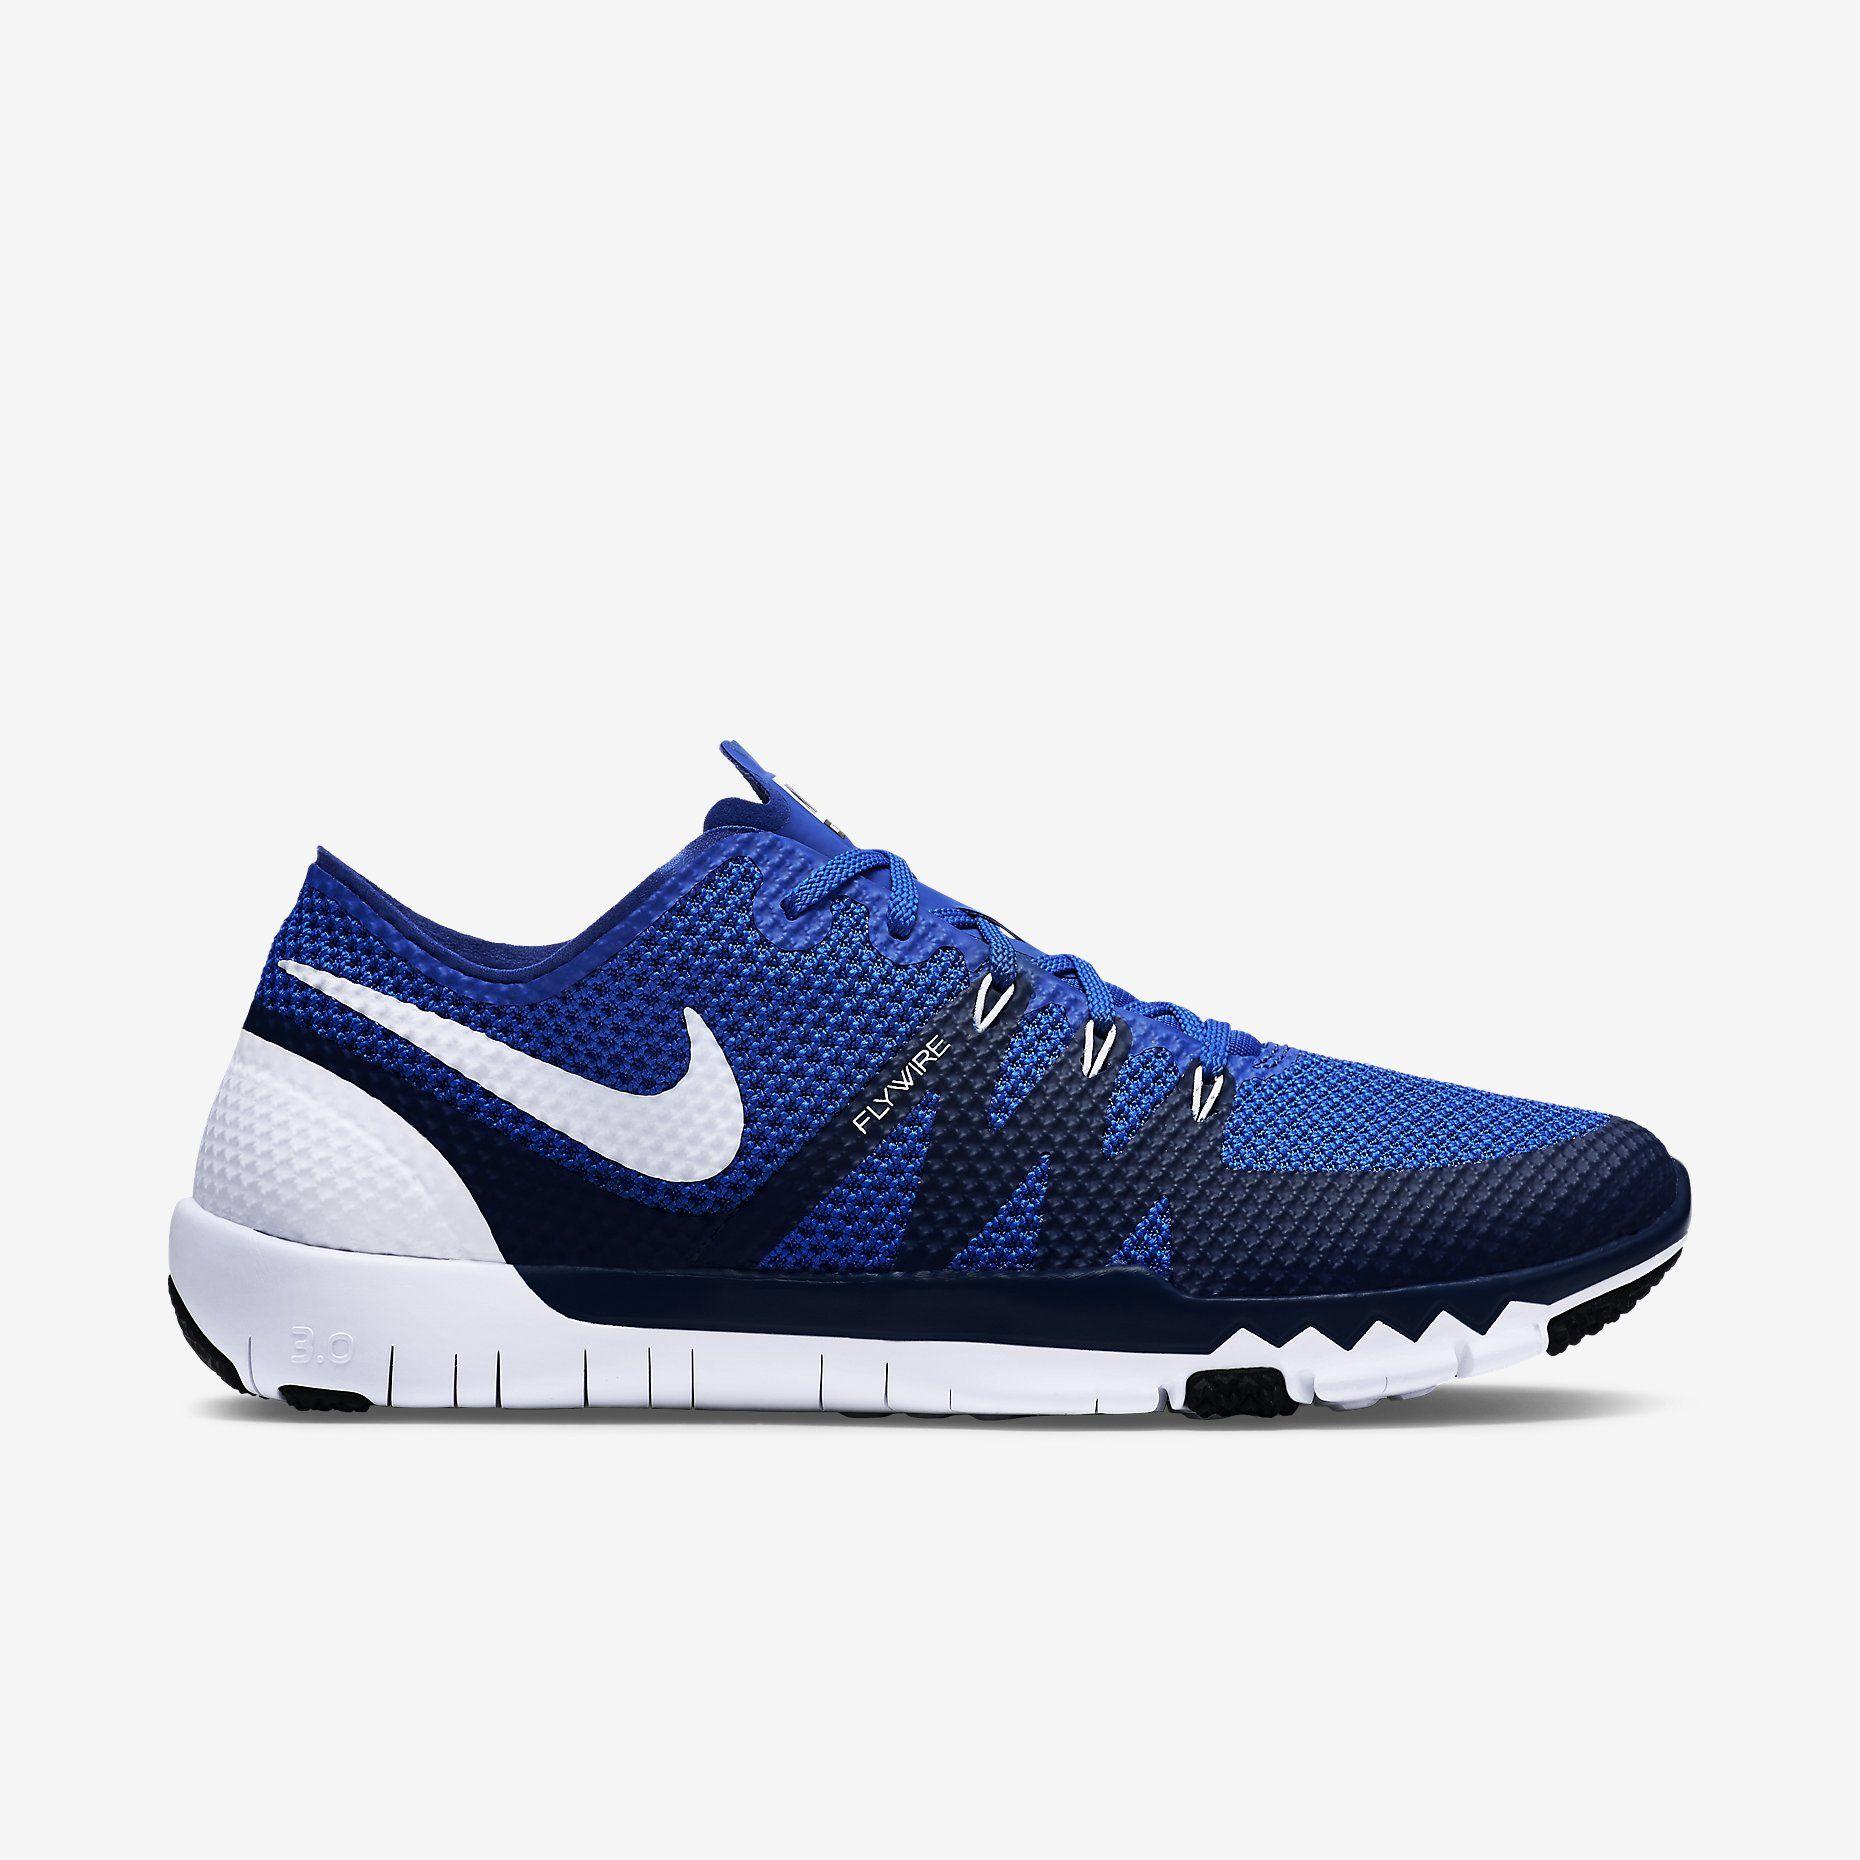 finest selection 3f6e2 ae249 Nike Free Trainer 3.0 V3 Men's Training Shoe. Nike Store ...